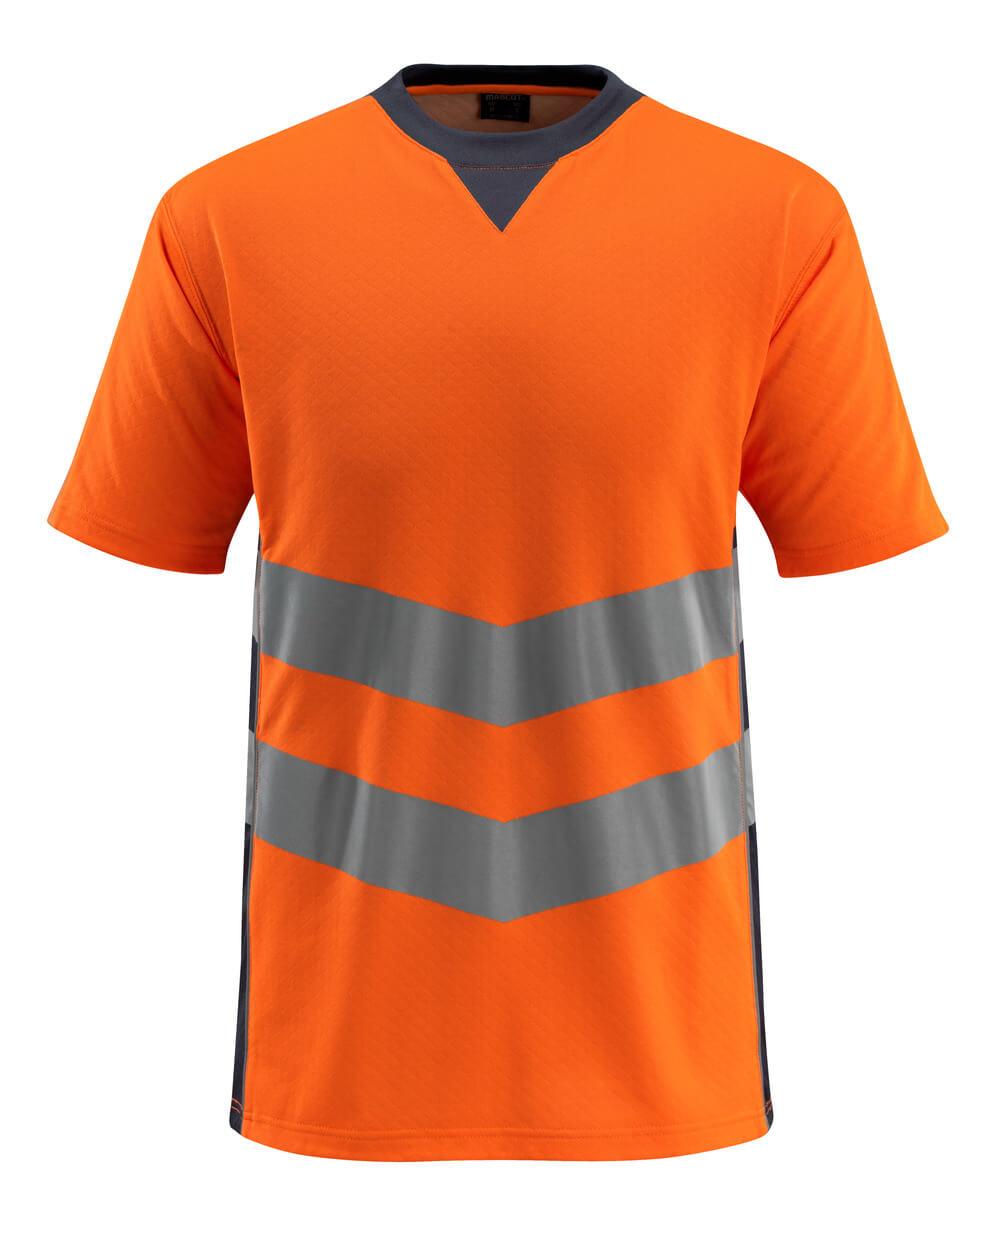 50127-933-14010 T-shirt - hi-vis orange/dark navy